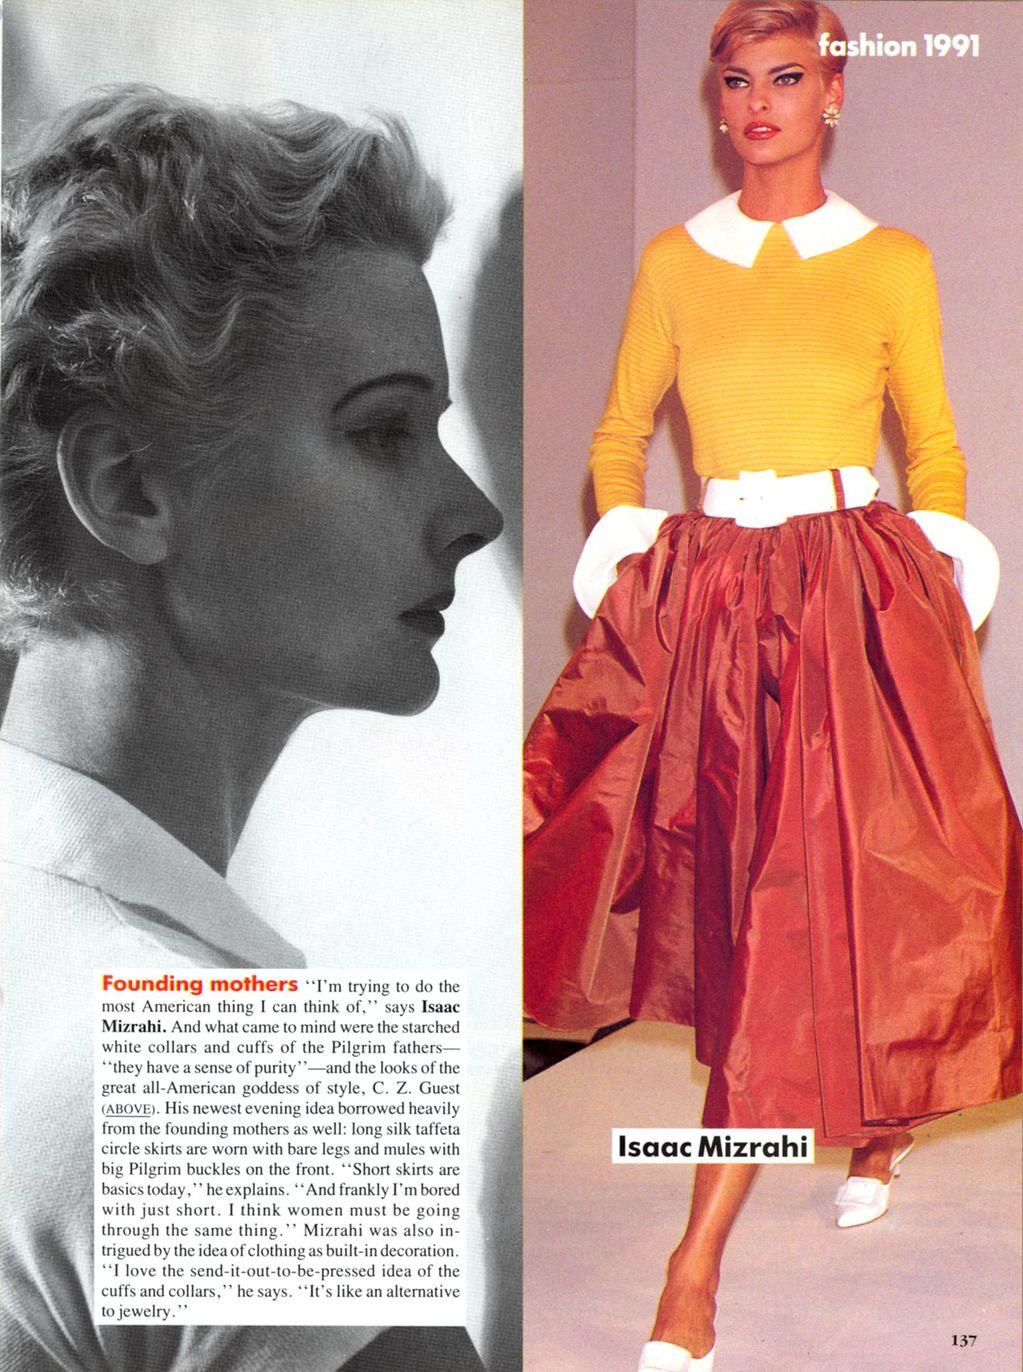 Vogue (US) January 1991 | Fashion 1991 06.jpg